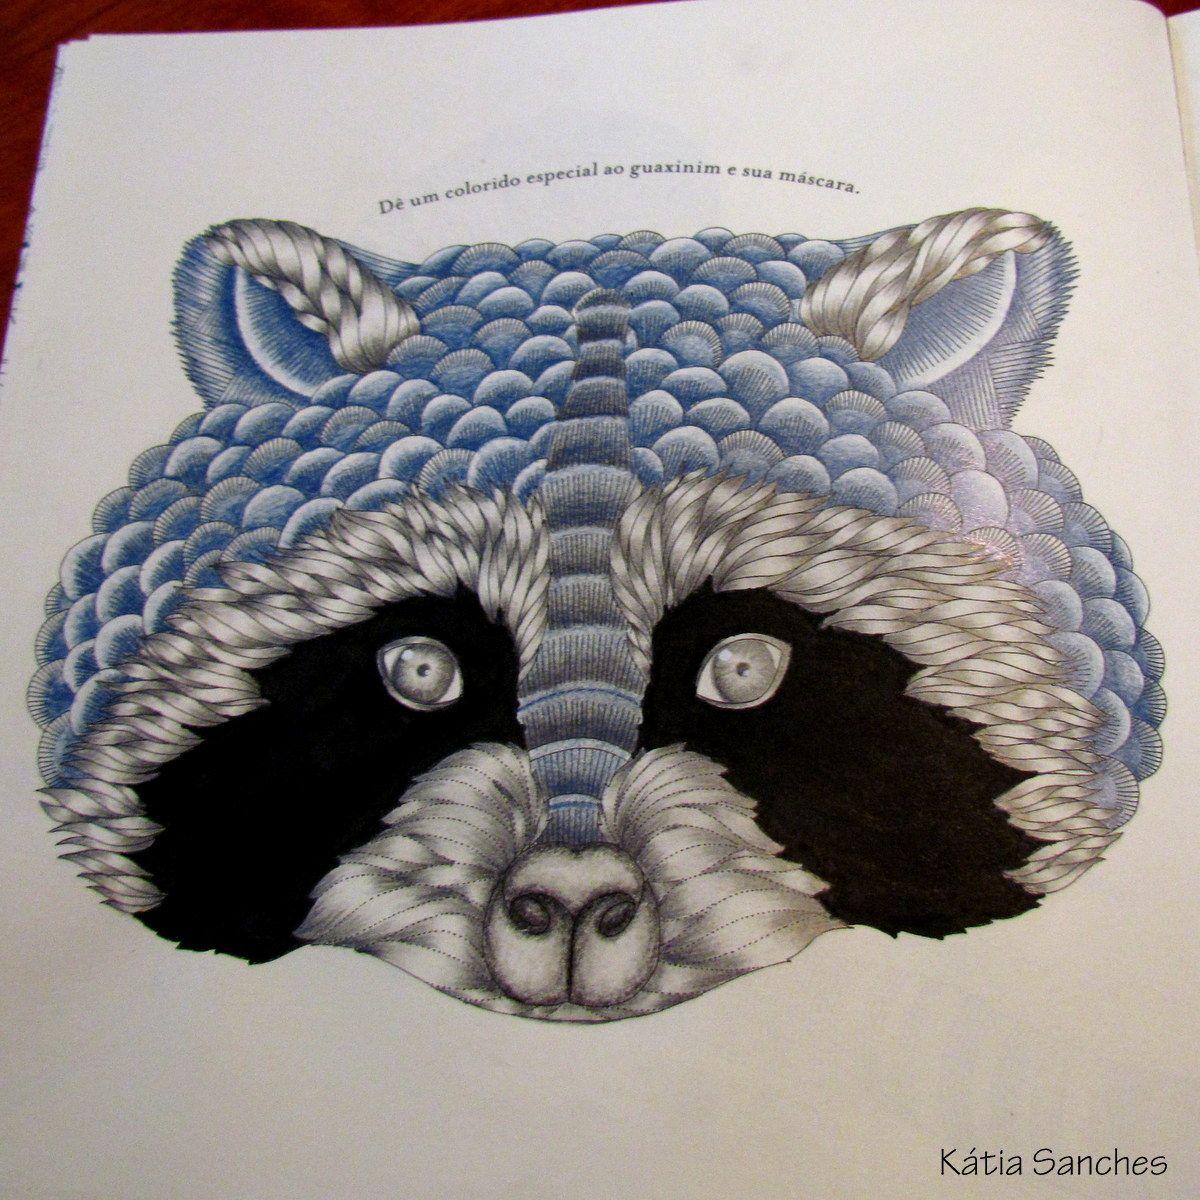 Animal Kingdom Coloring Book Millie Marotta Animal Kingdom Colouring Book Millie Marotta Animal Kingdom Millie Marotta Coloring Book